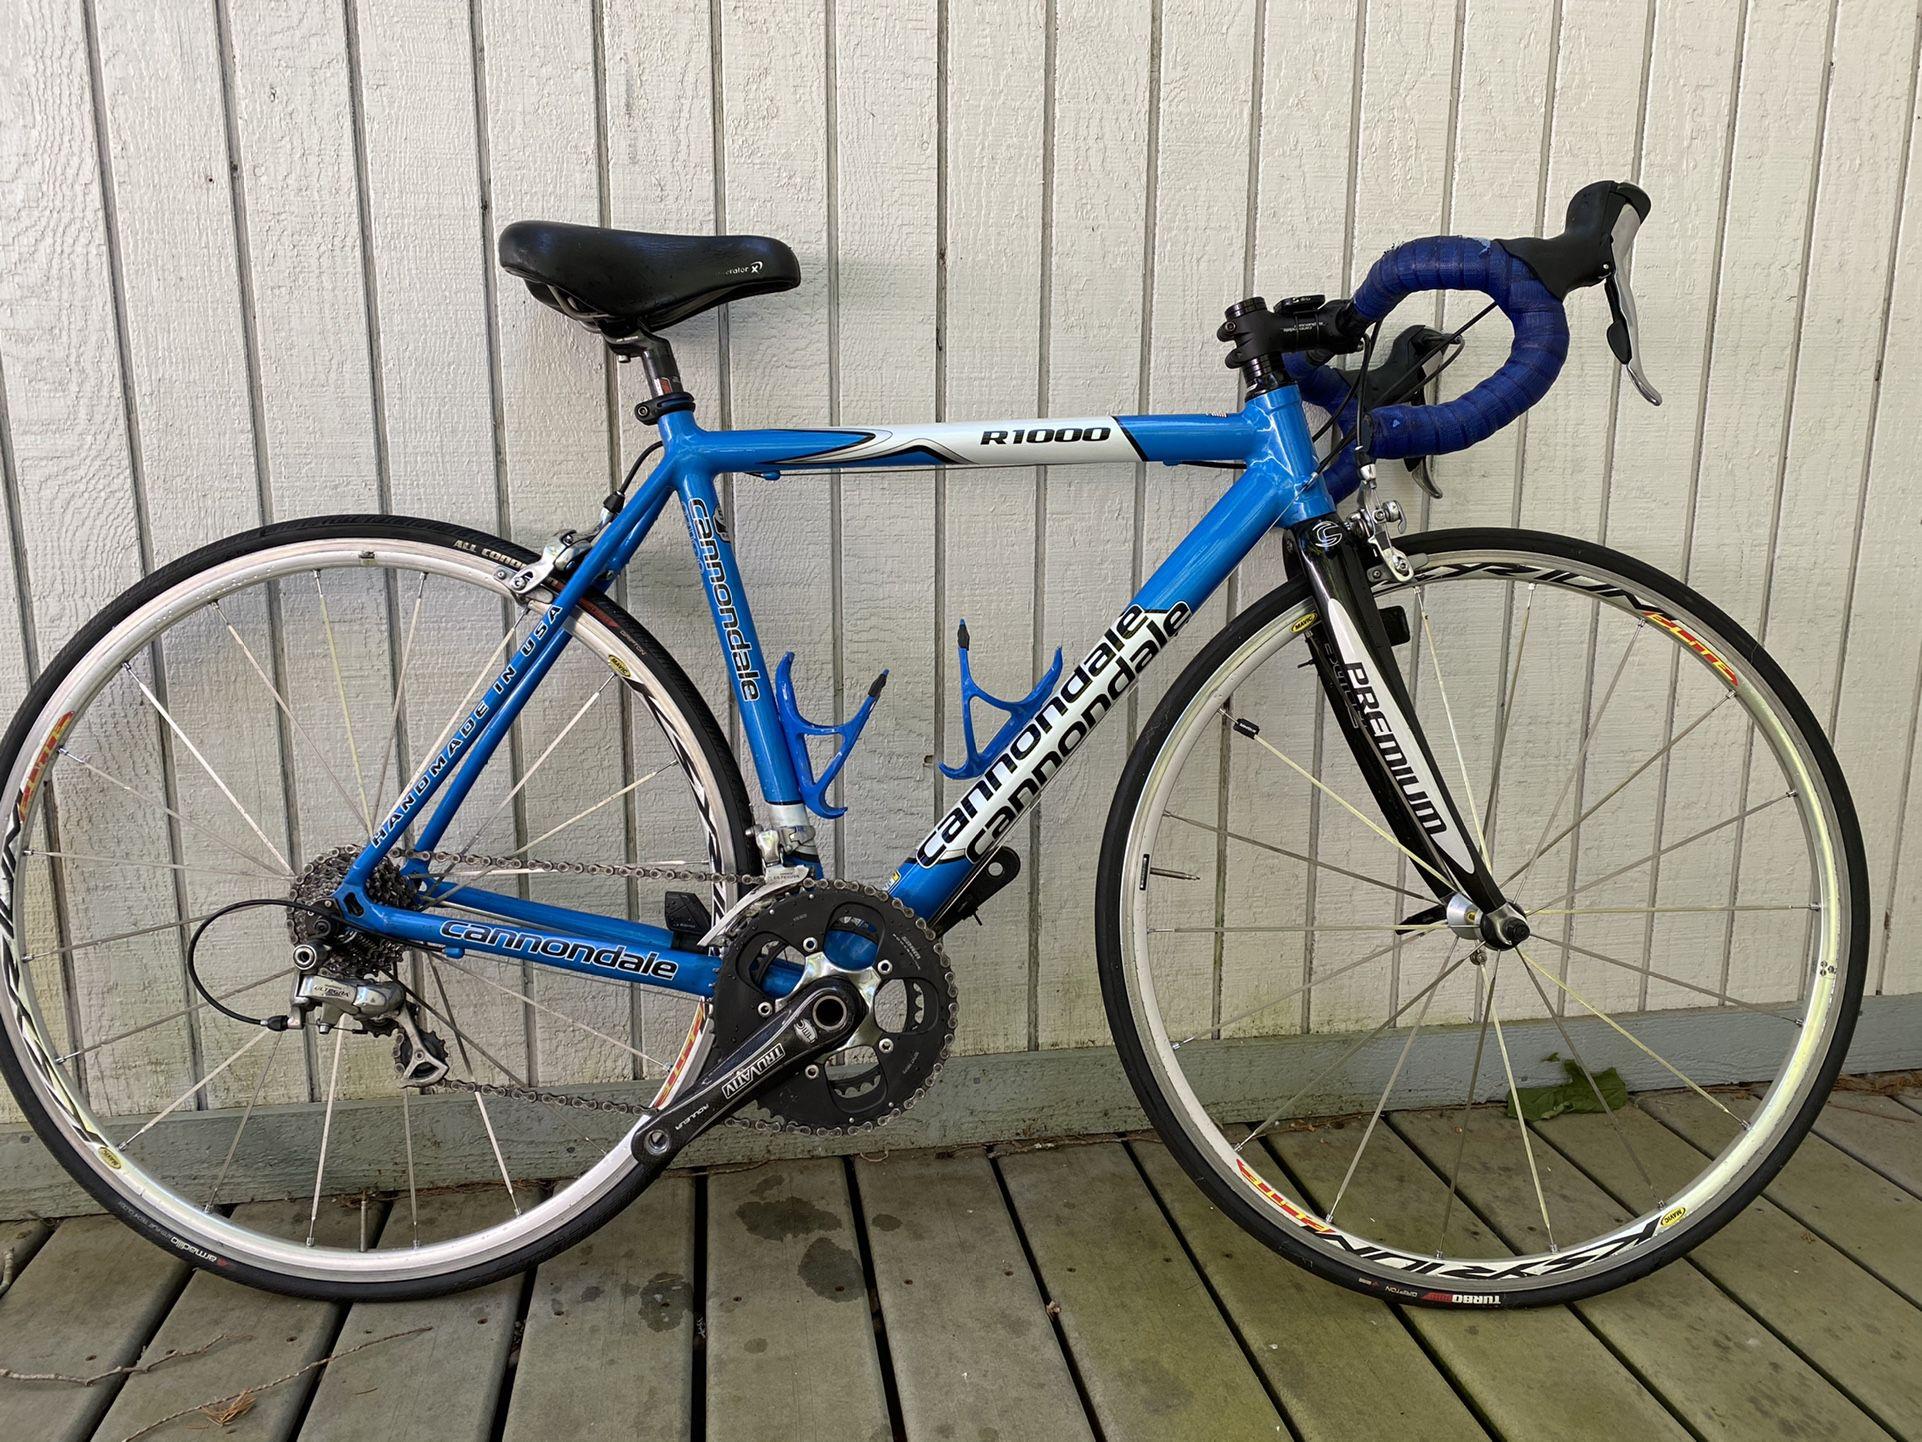 XS Cannondale R1000 Roadbike